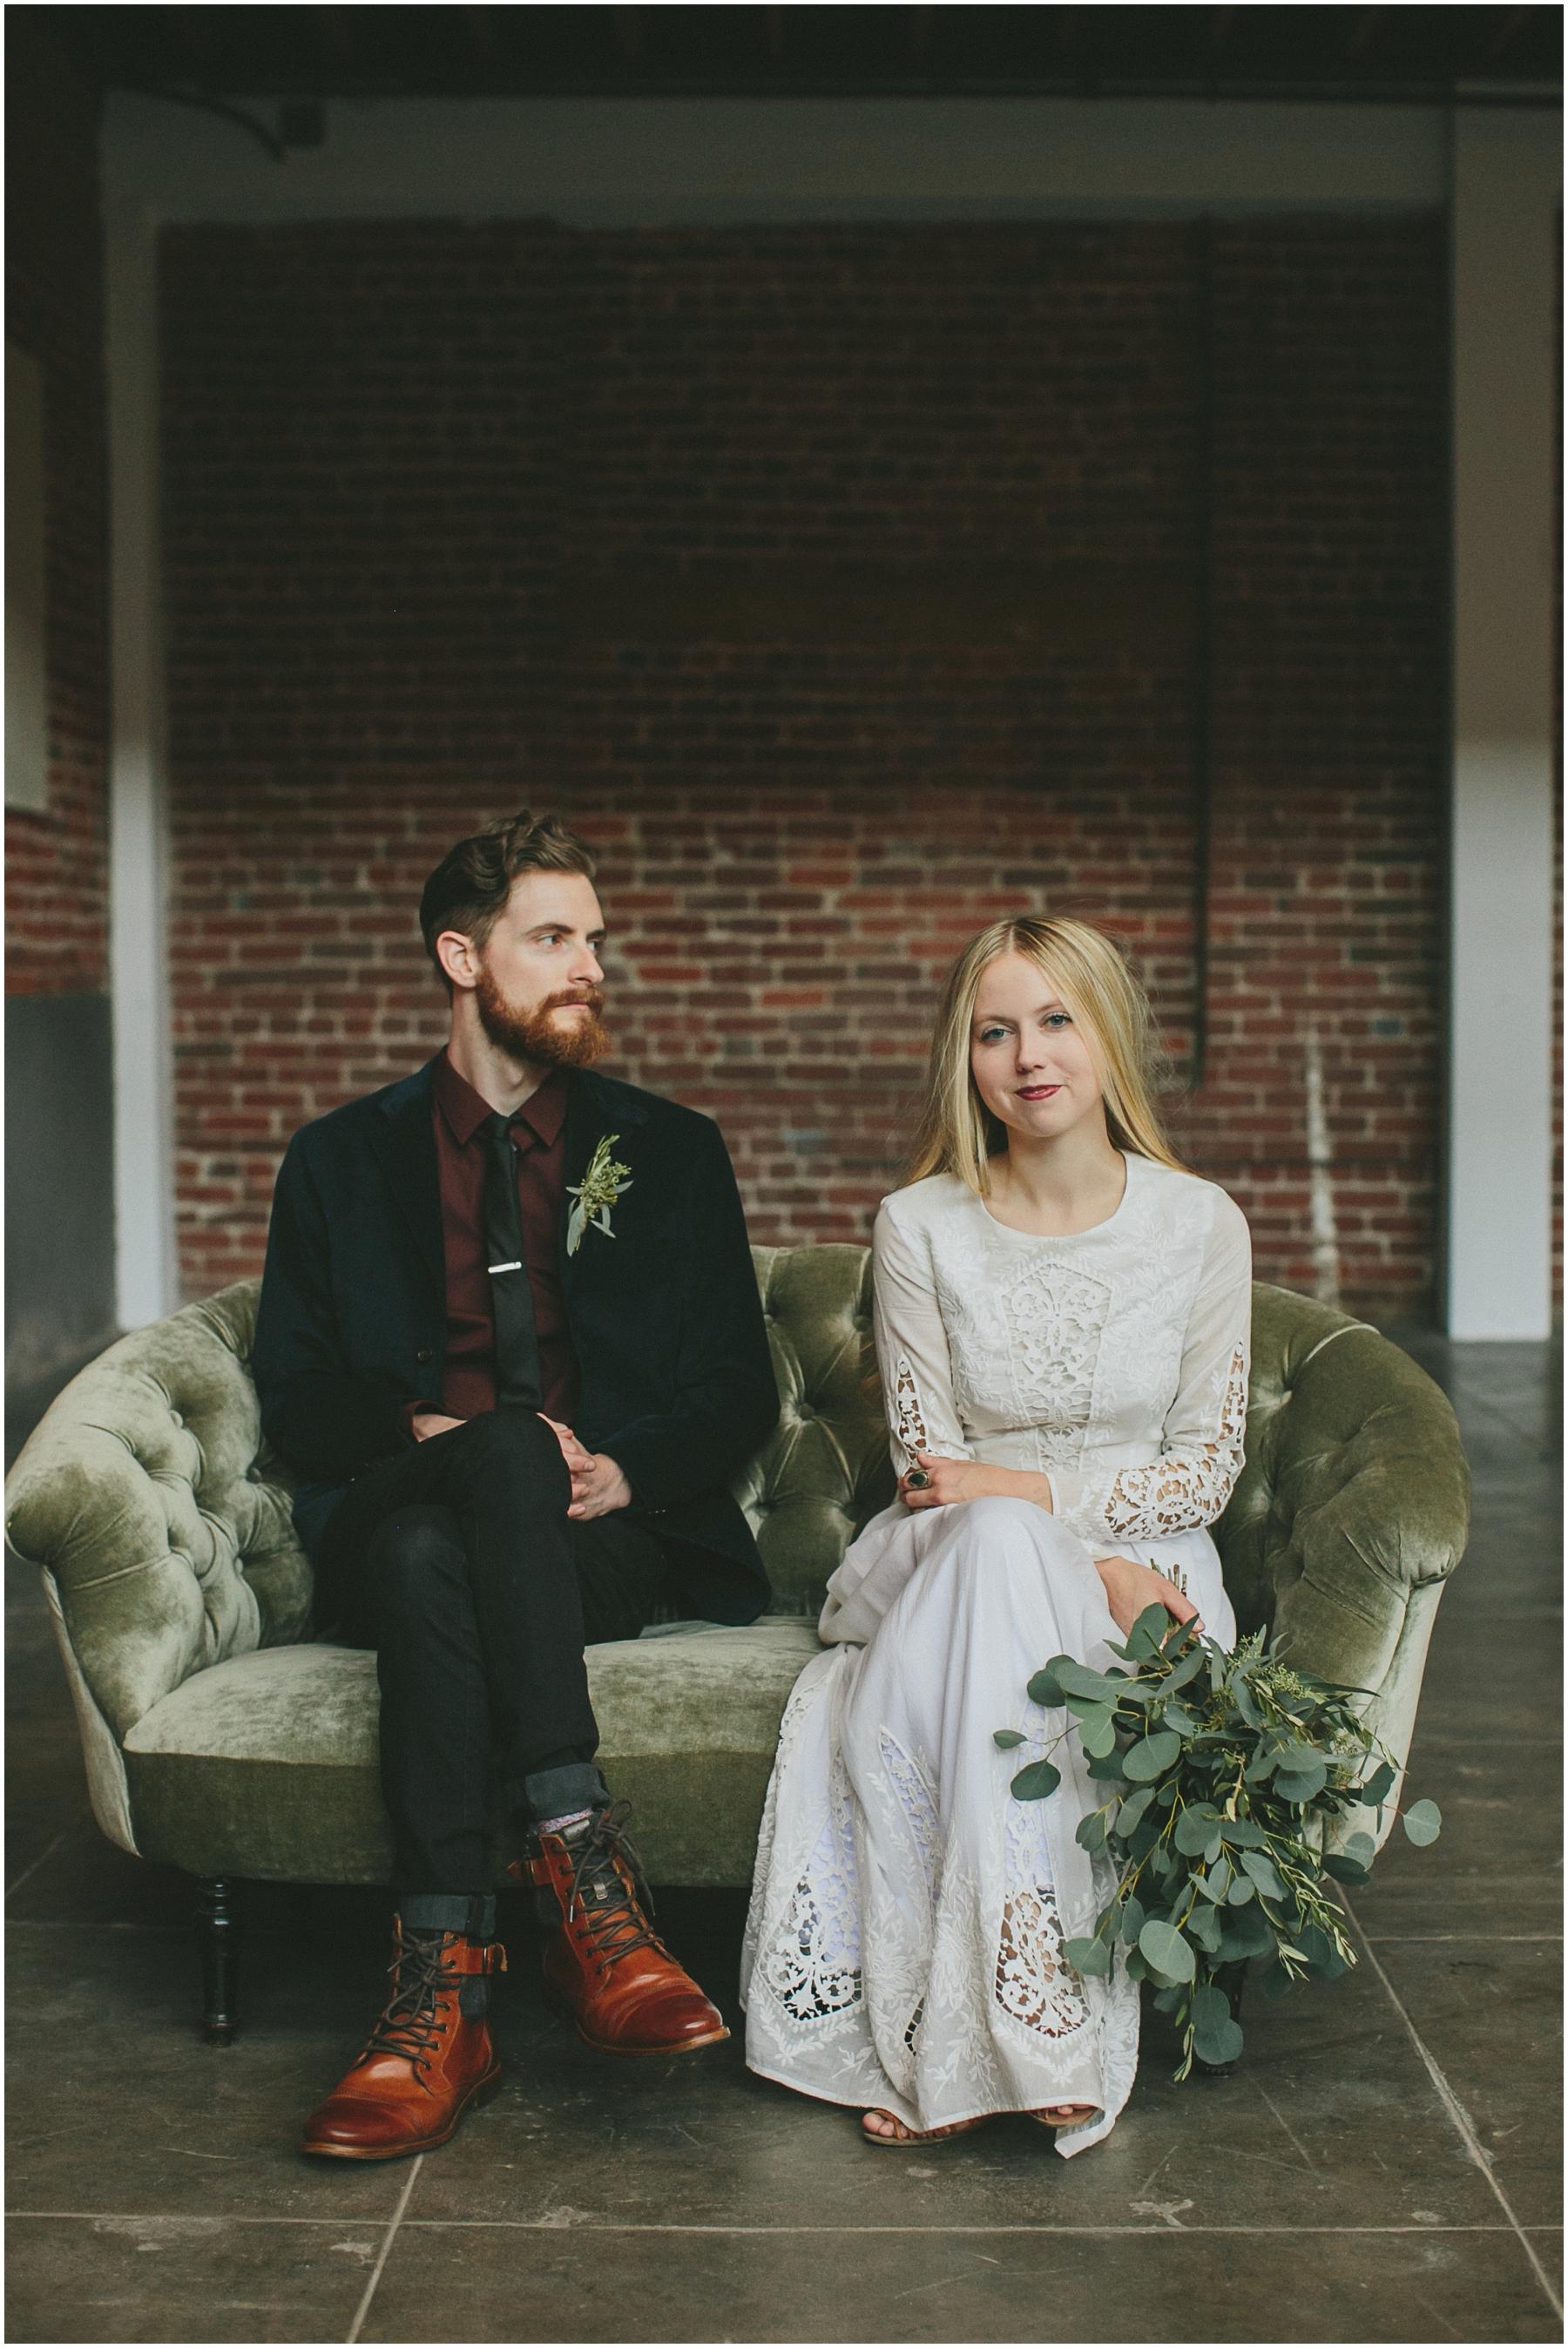 Natalie+Corey-WEDDING_KELLYBOITANO_0048